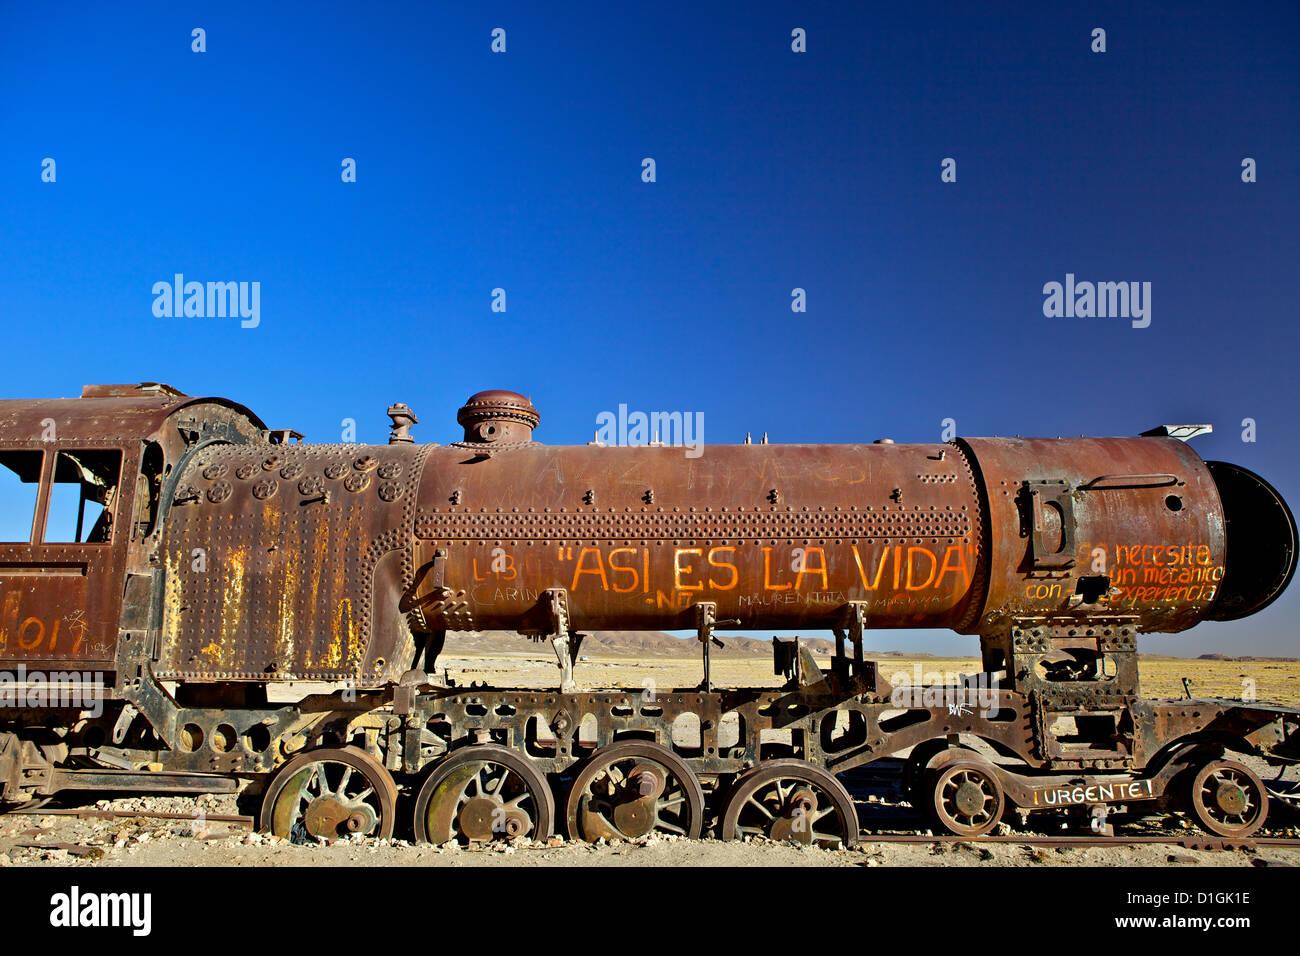 Rusting old steam locomotive at the Train cemetery (train graveyard), Uyuni, Southwest, Bolivia, South America - Stock Image